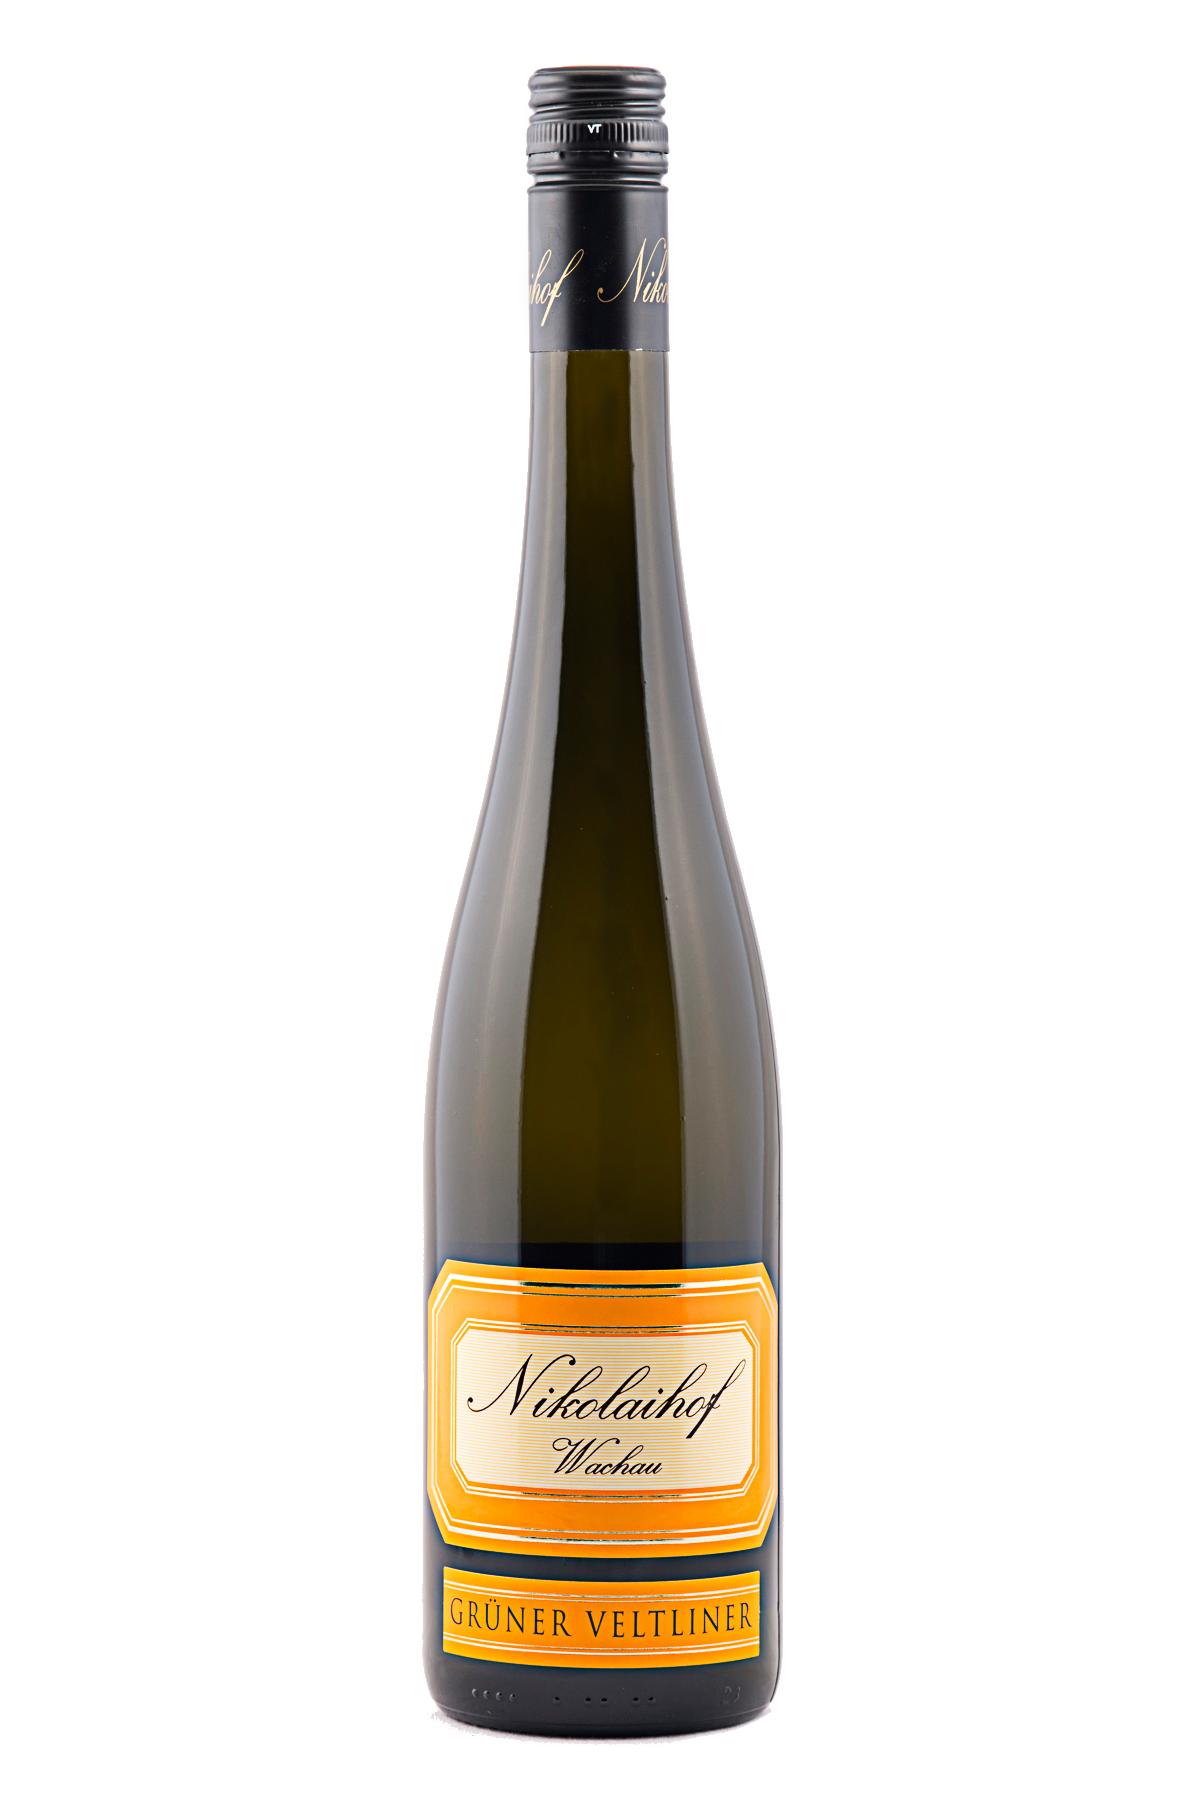 2012_Nikolaihof_Im Weingebirge_Grüner Veltliner_Federspiel